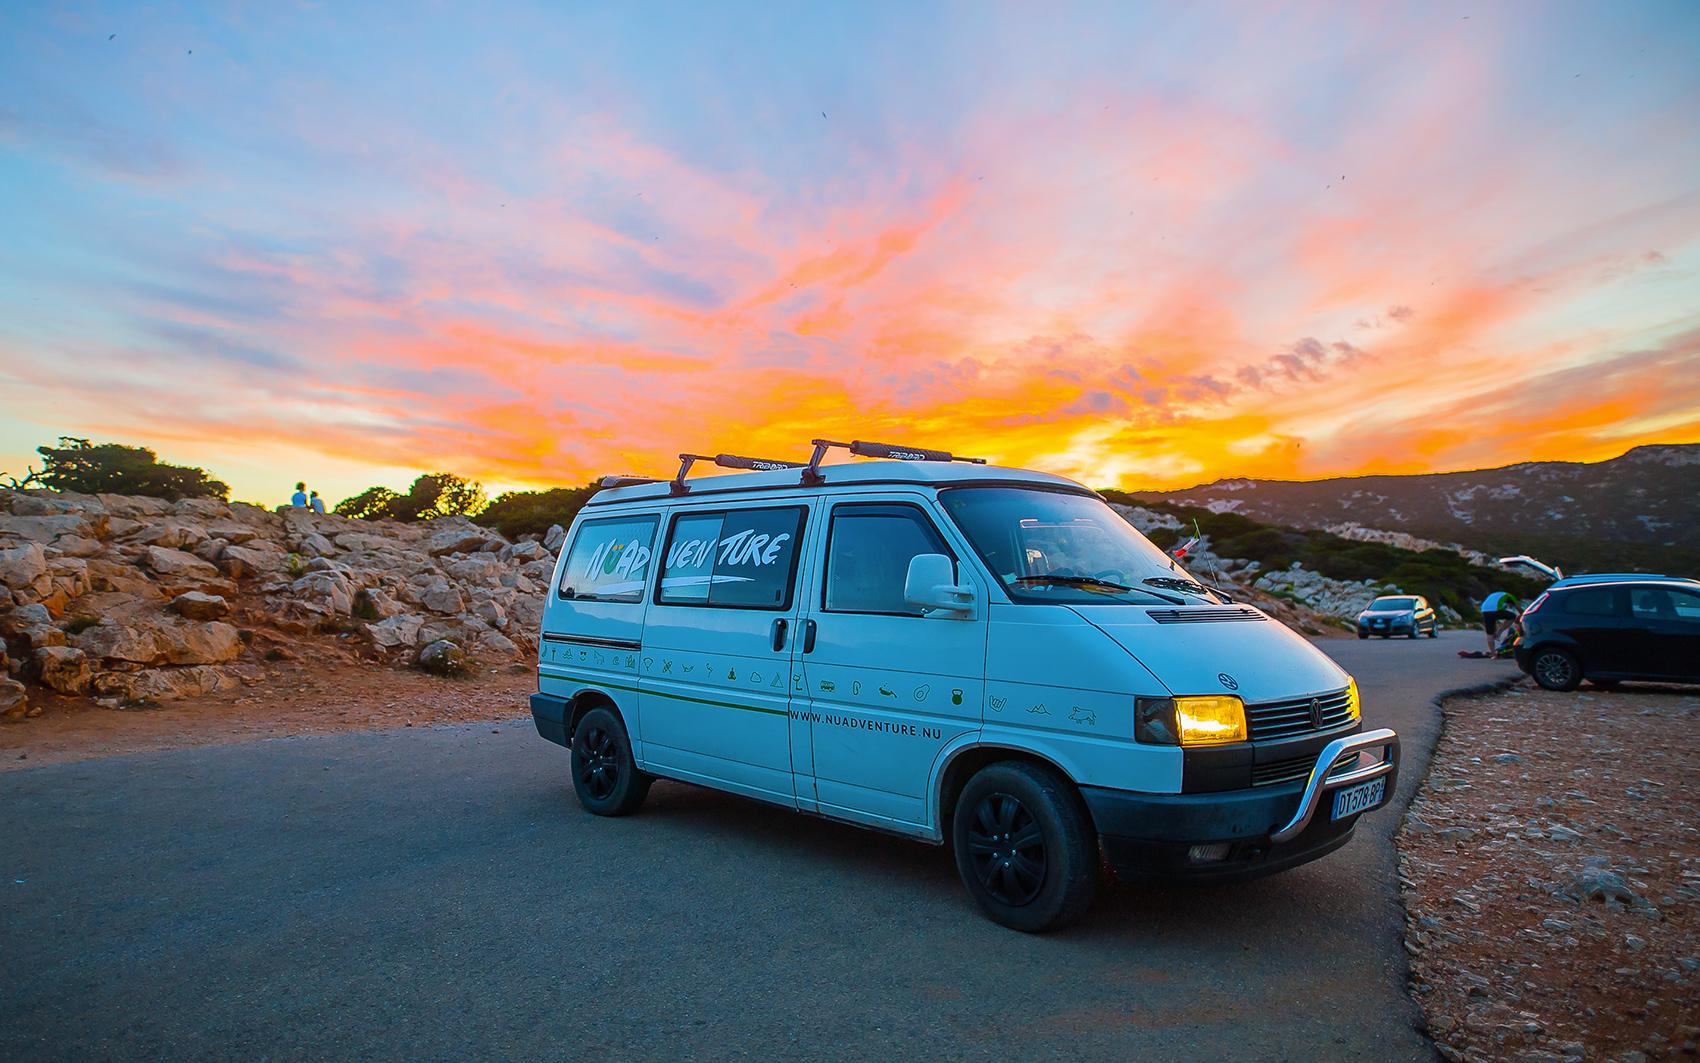 Rent Camper Van in Sardinia   Get our Super Camper Van and